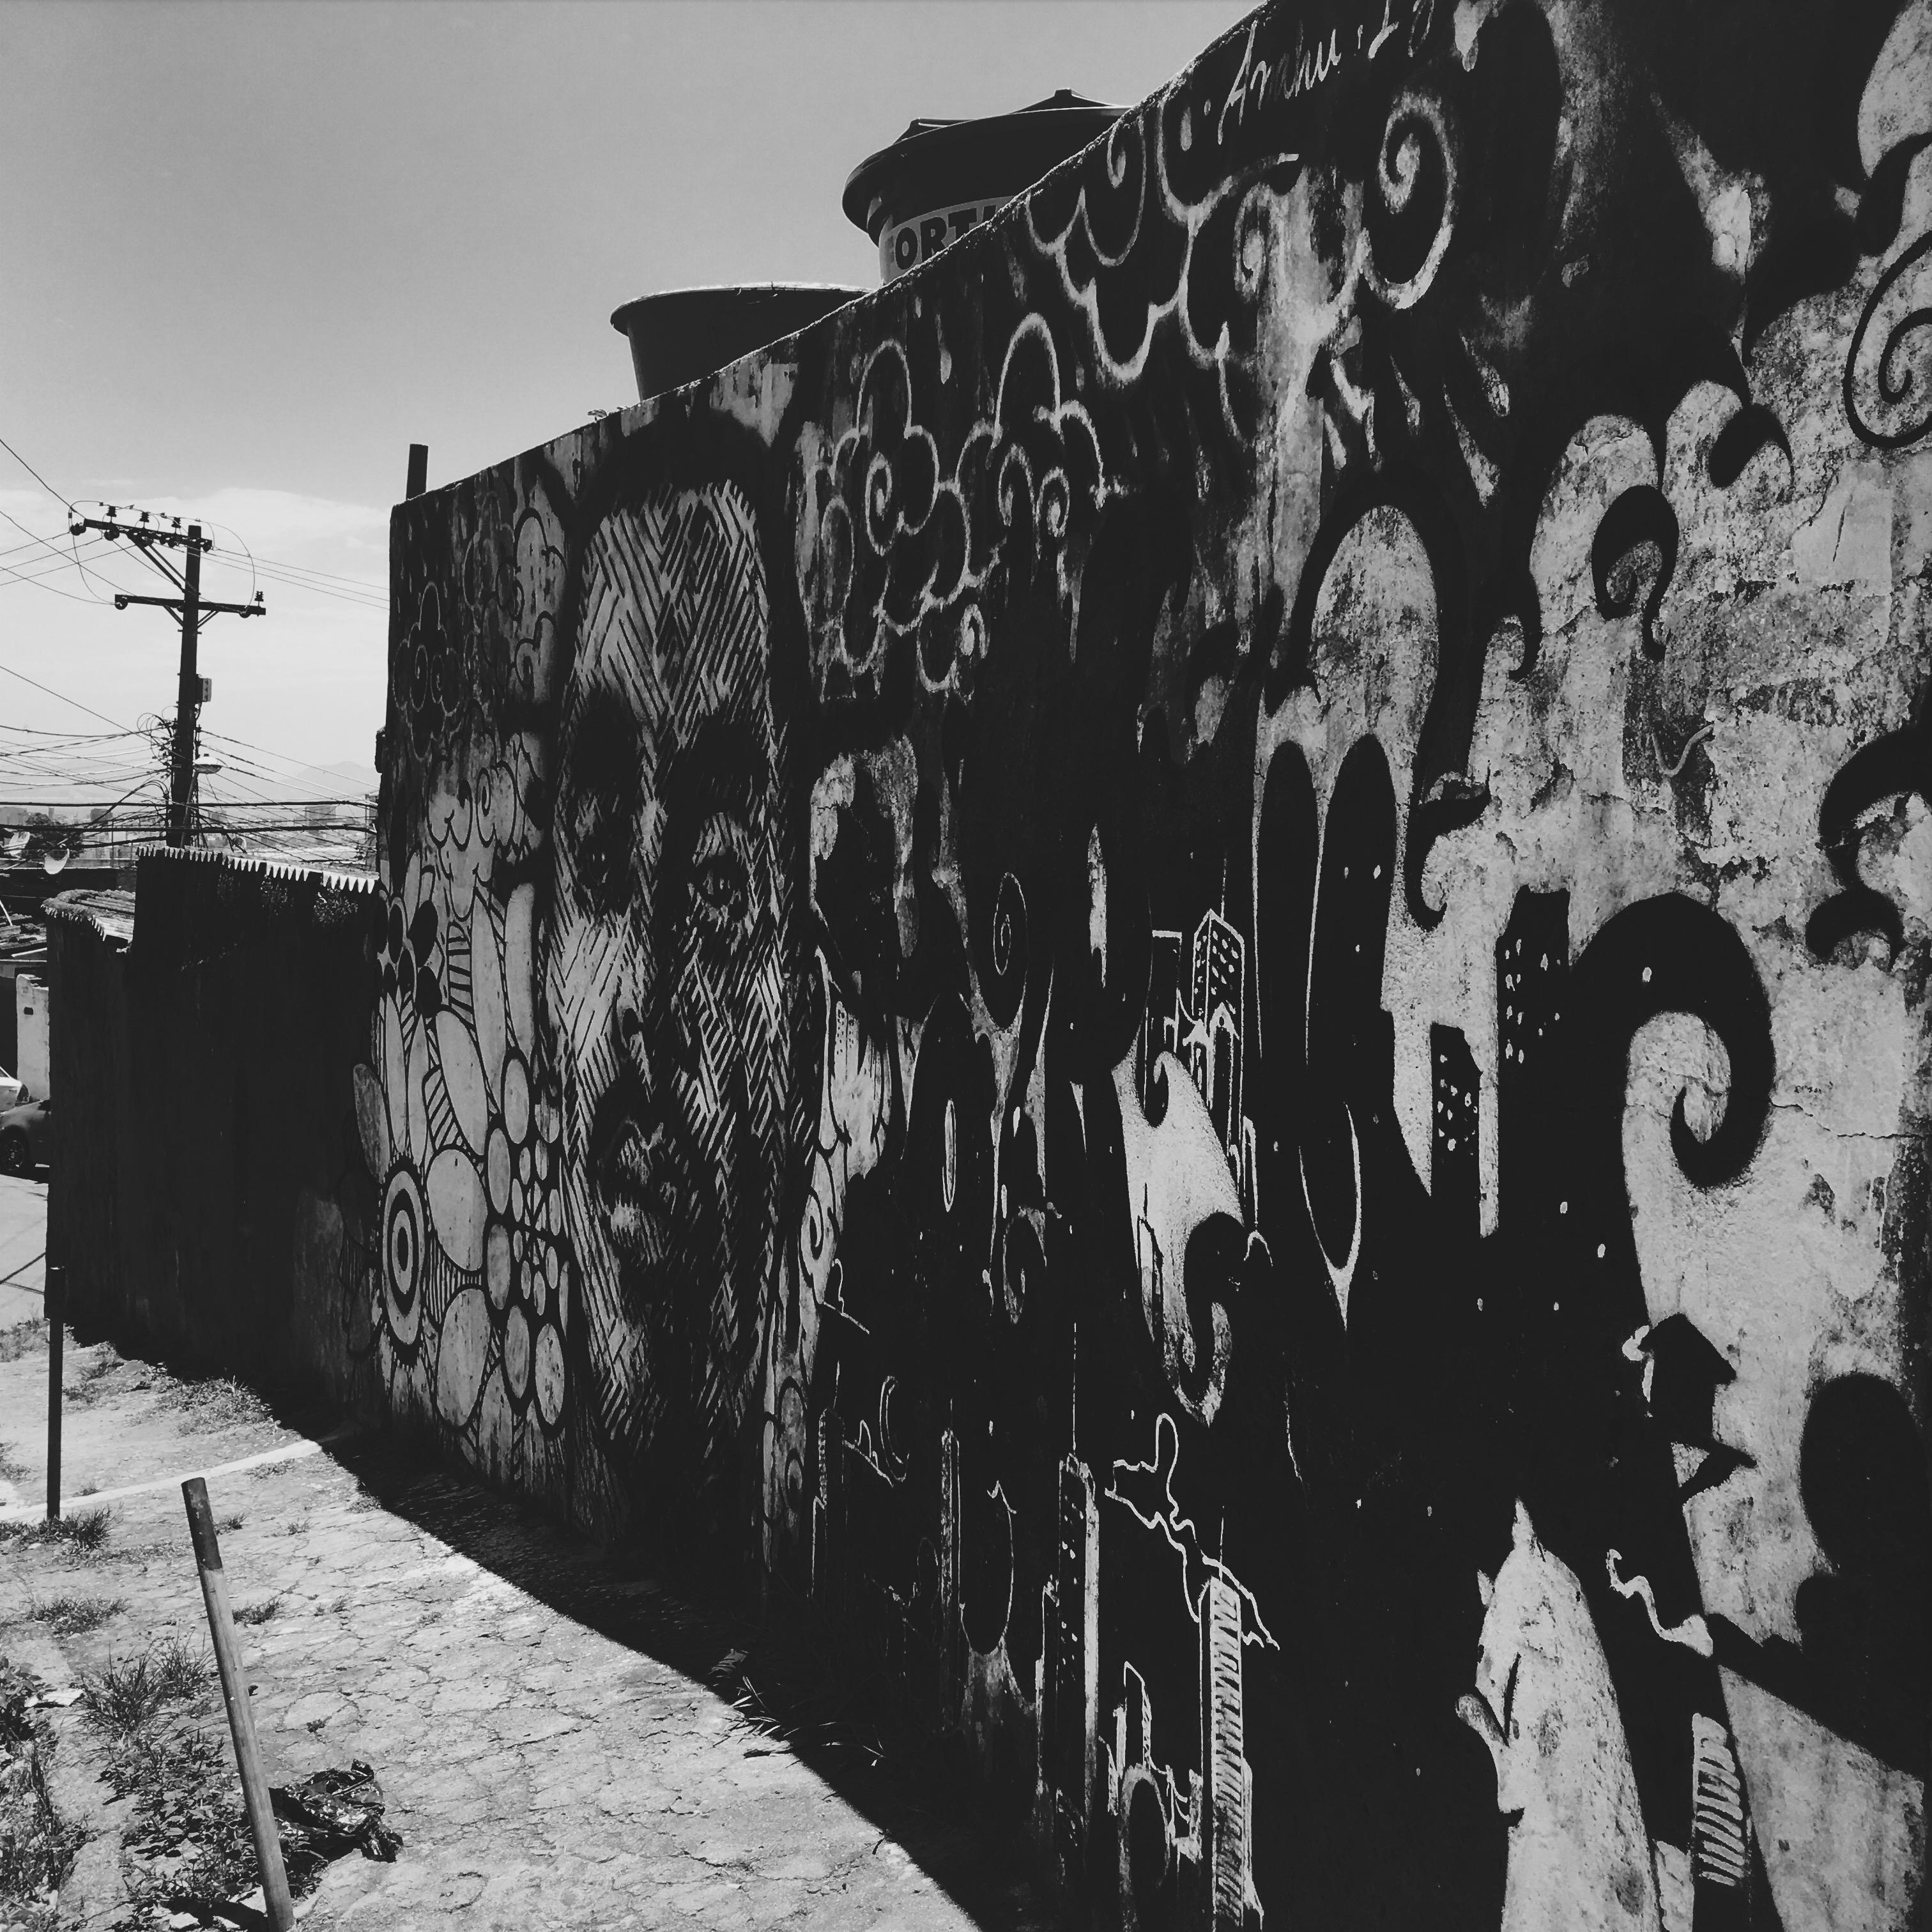 Amazing local graffiti in Vidigal